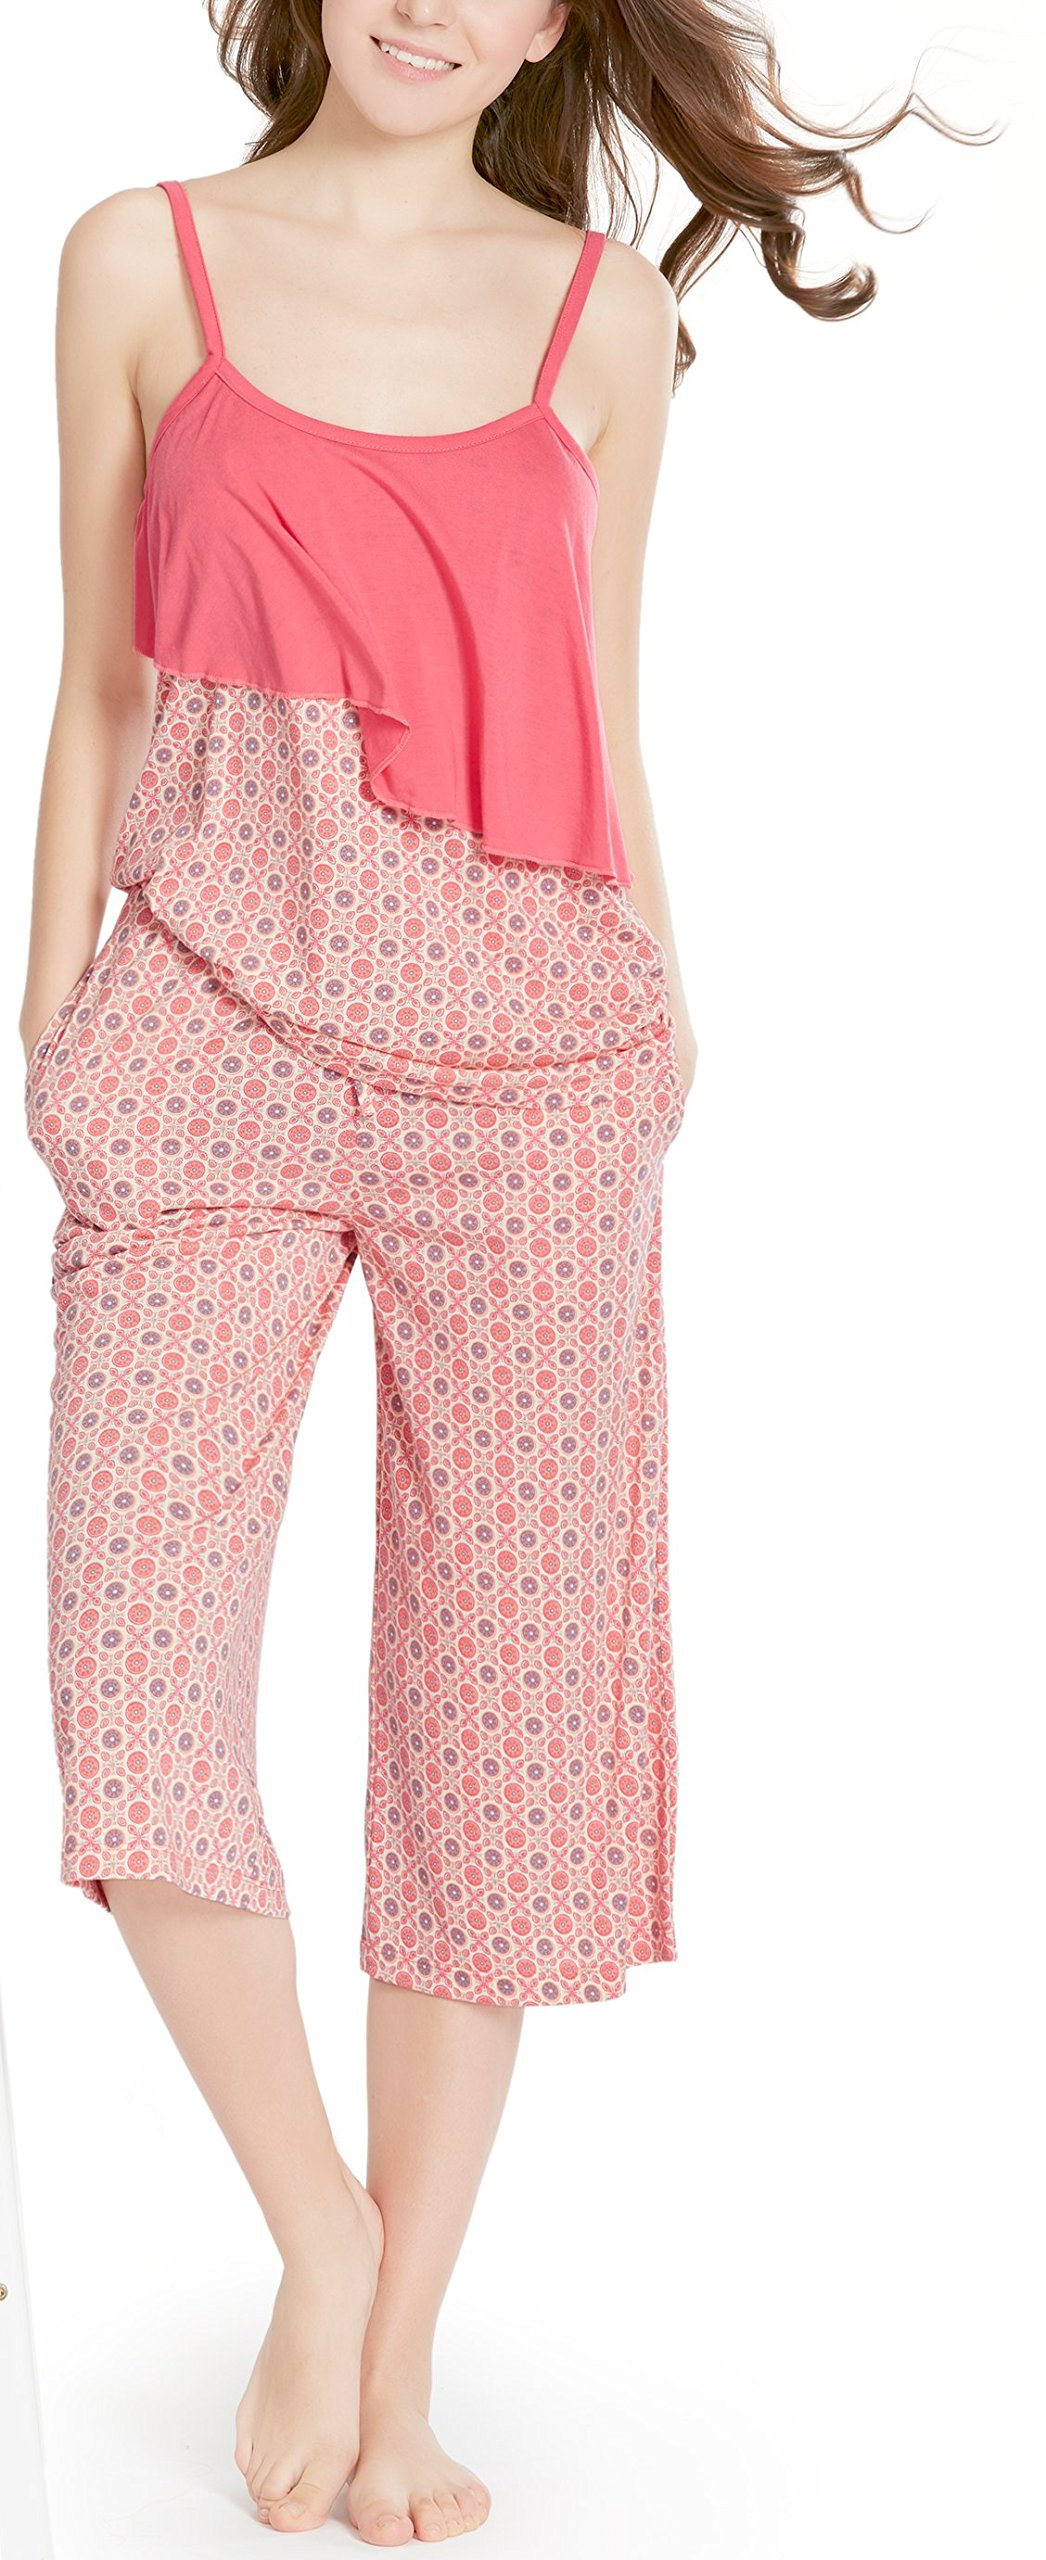 Summer Pajamas for Women, Camisole Capri Pajama for Woman - Pjs Women Tank Tops Lounge Capris Sets Sunbrella M